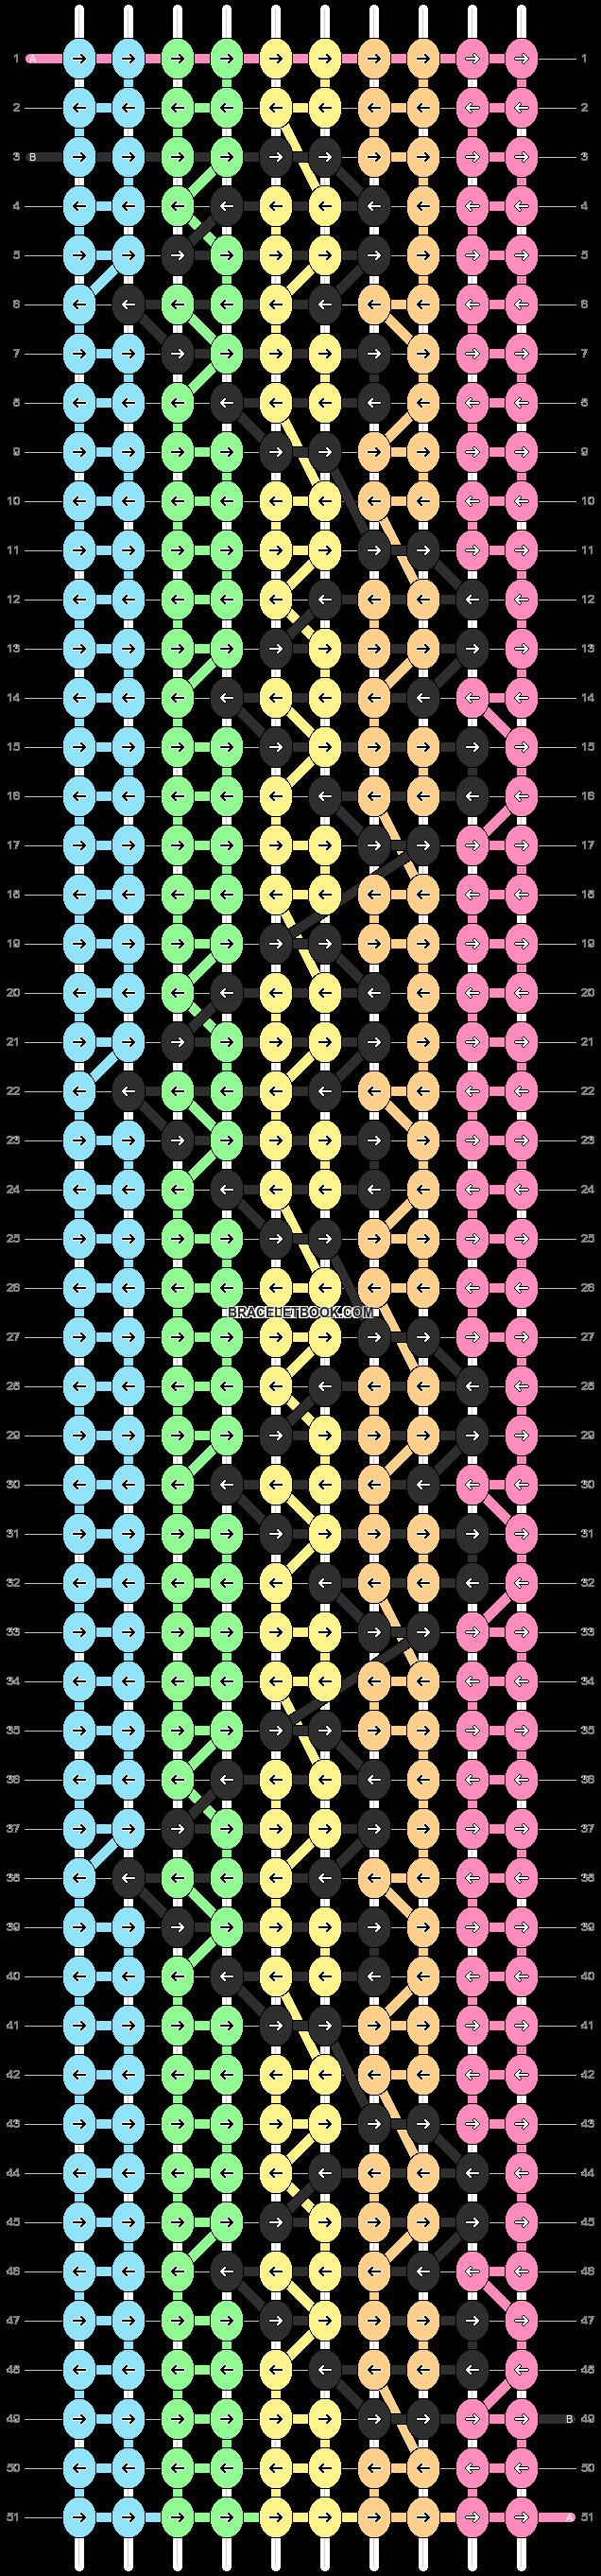 Alpha pattern #20365 pattern